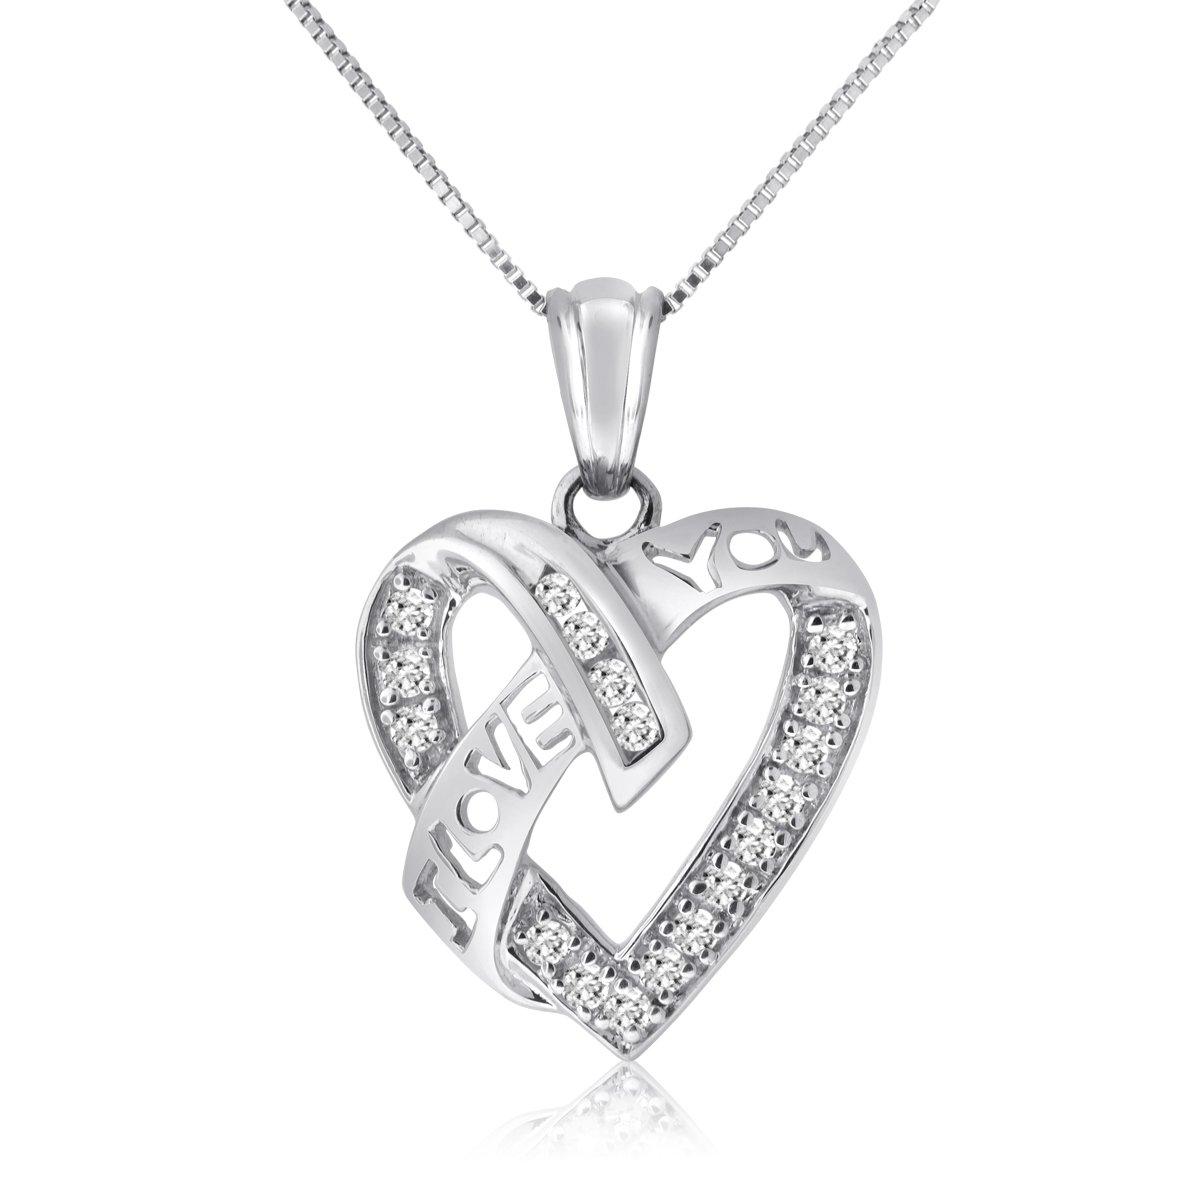 1/4 Cttw ''I Love You'' Diamond Heart Pendant in 10KT White Gold